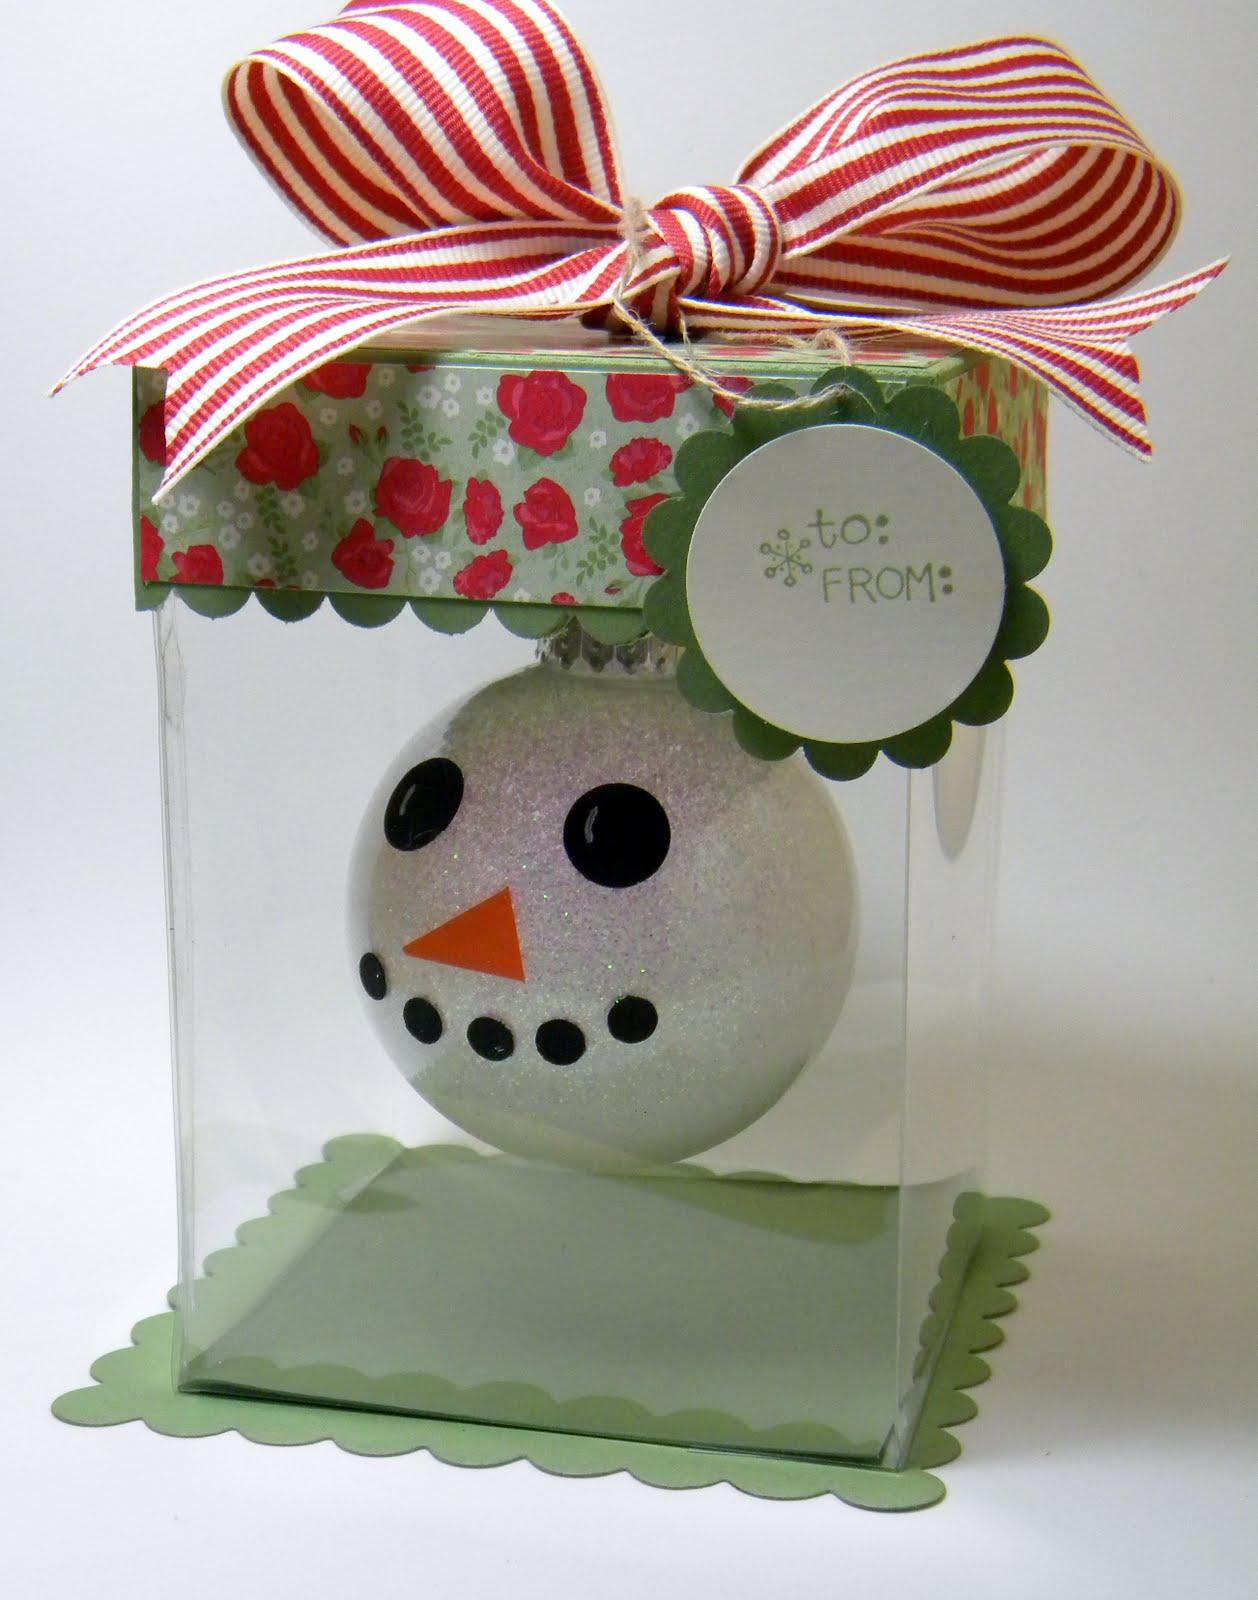 My little craft ornament gift box